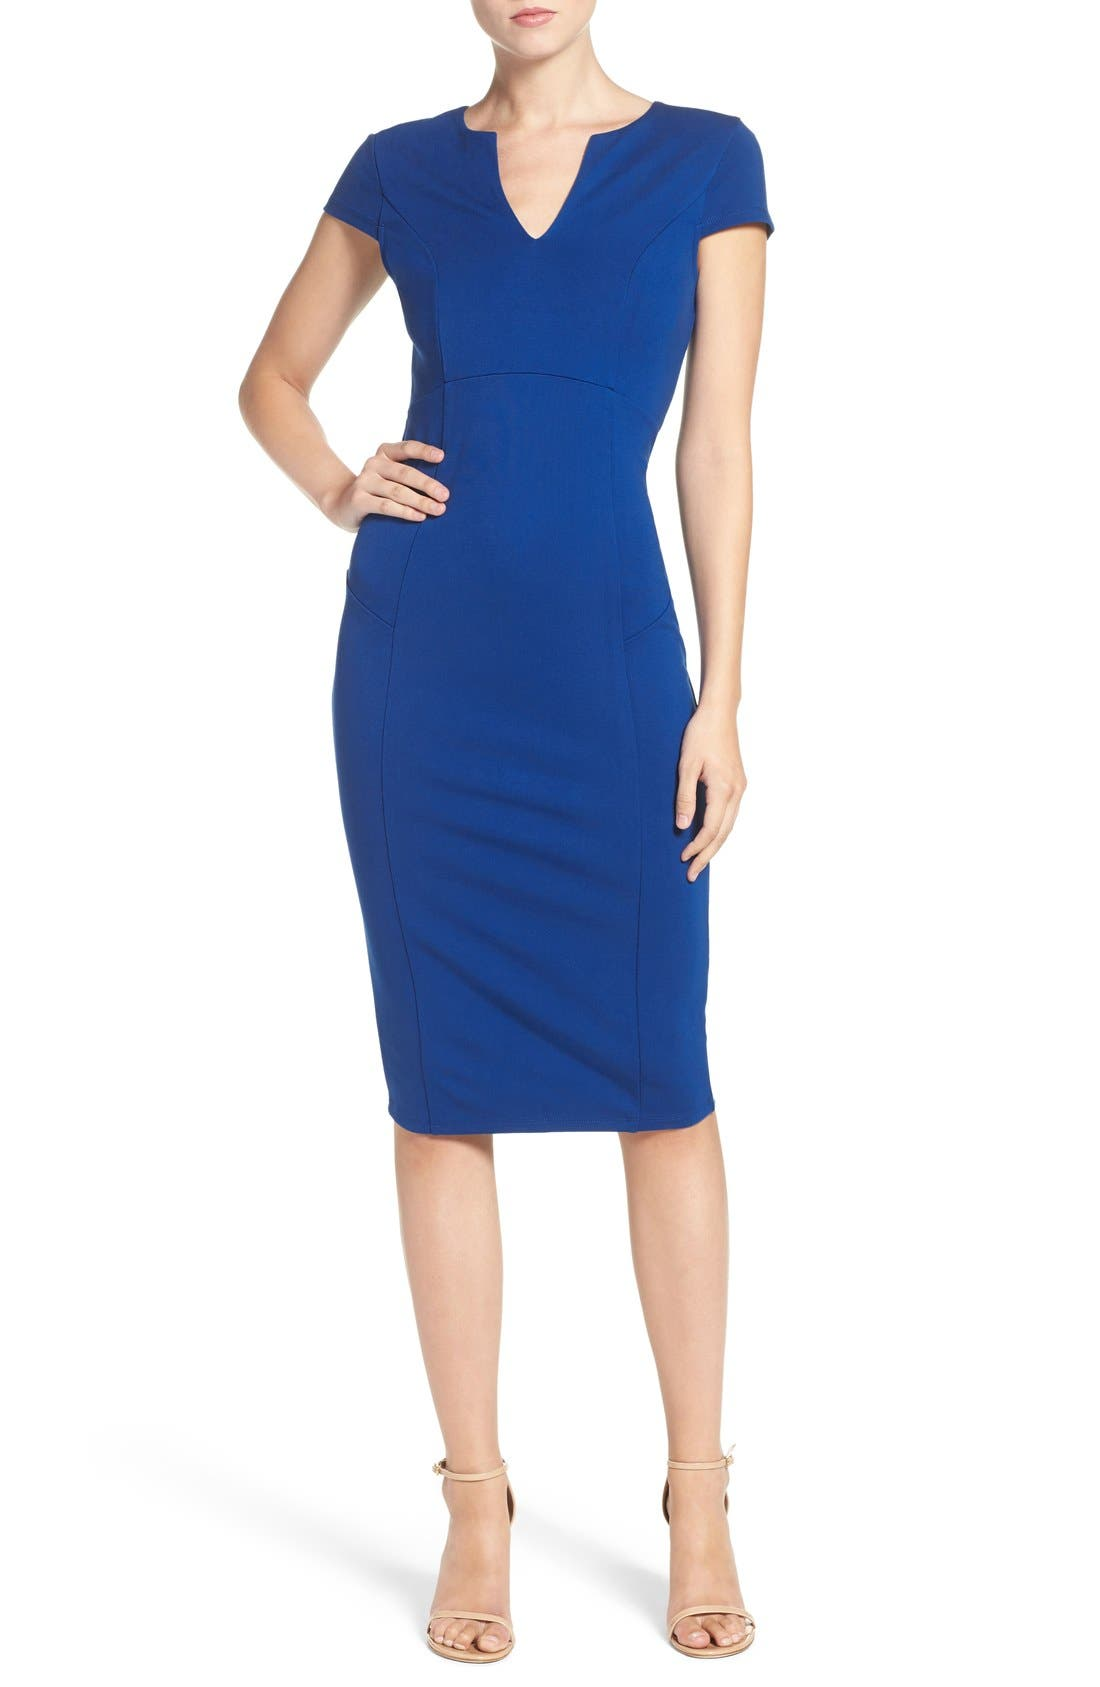 Alternate Image 1 Selected - Felicity & Coco V-Neck Ponte Knit Midi Sheath Dress (Regular & Petite) (Nordstrom Exclusive)